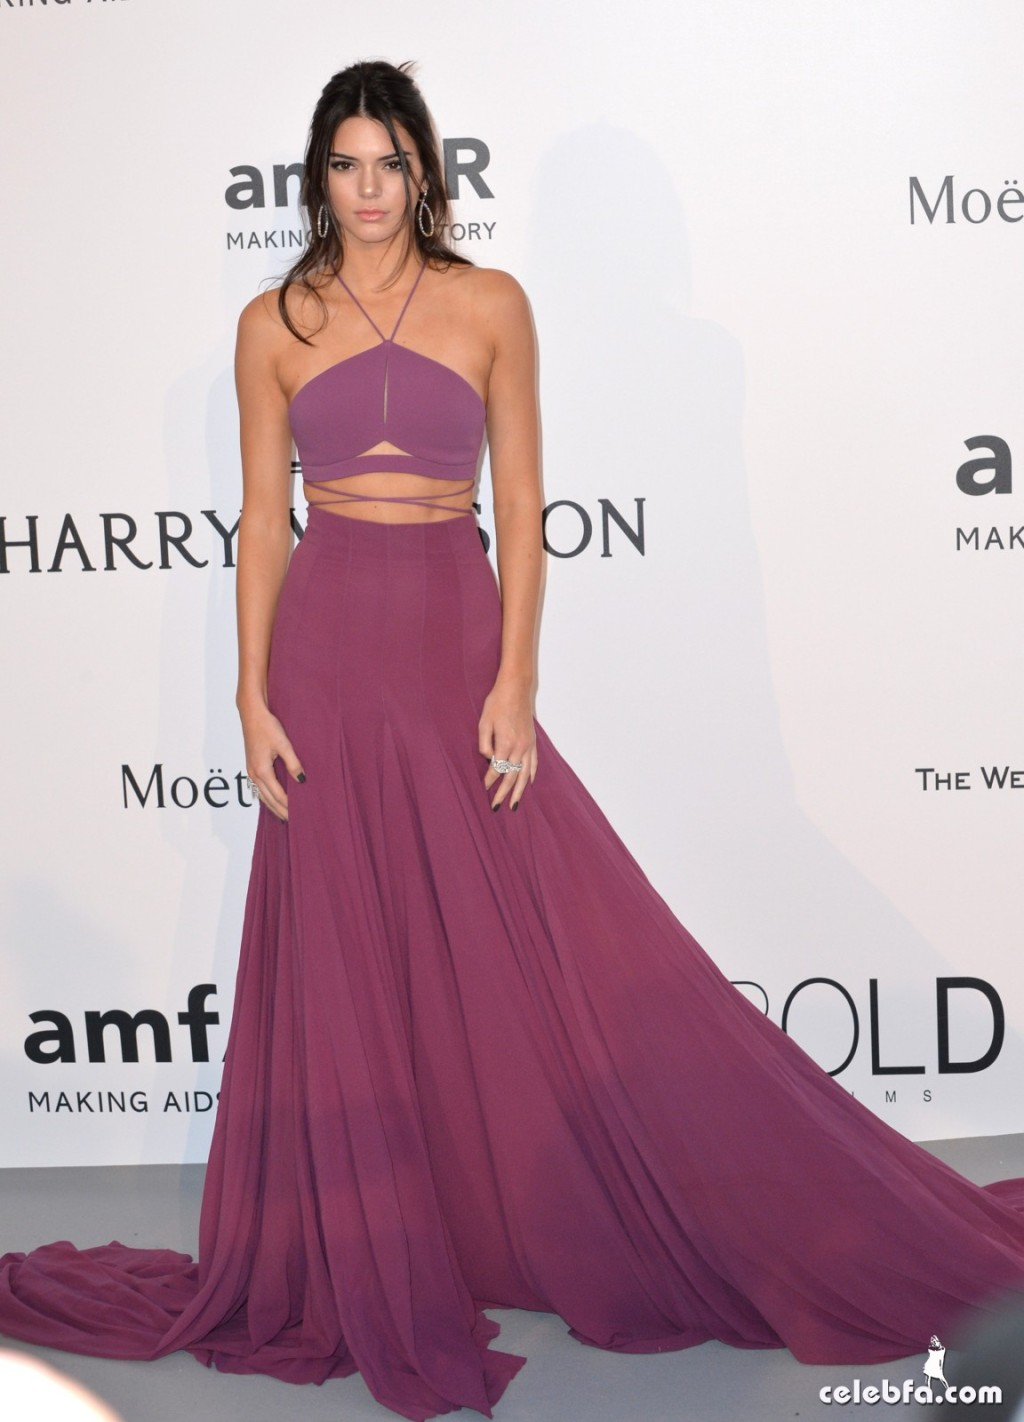 Kendall_Jenner_amfAR's Cannes Gala (16)